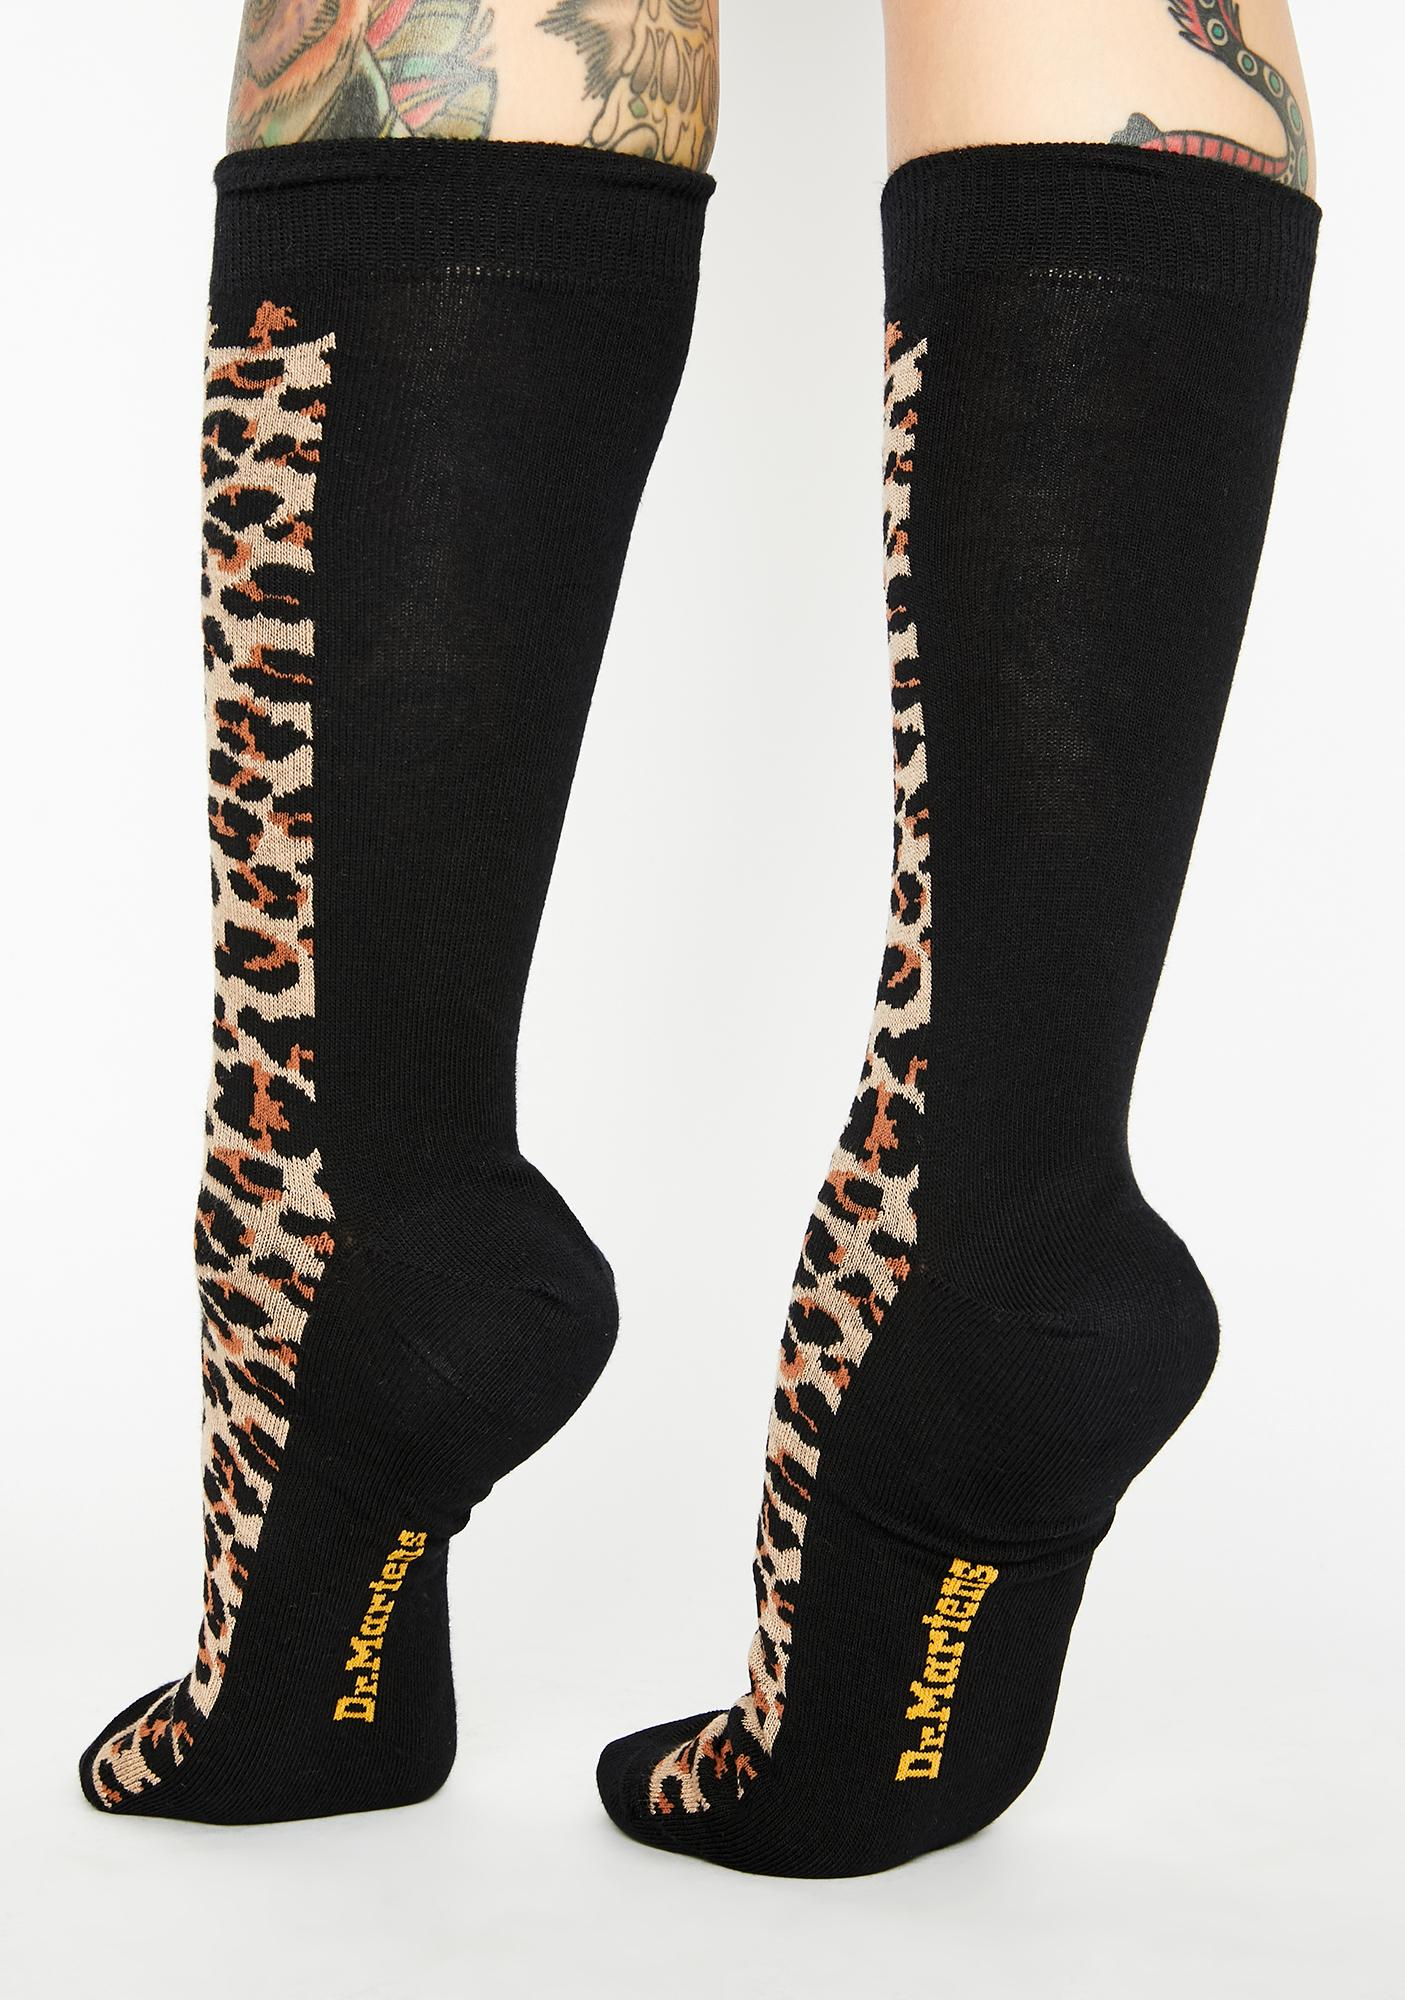 Dr. Martens Leopard Print Socks